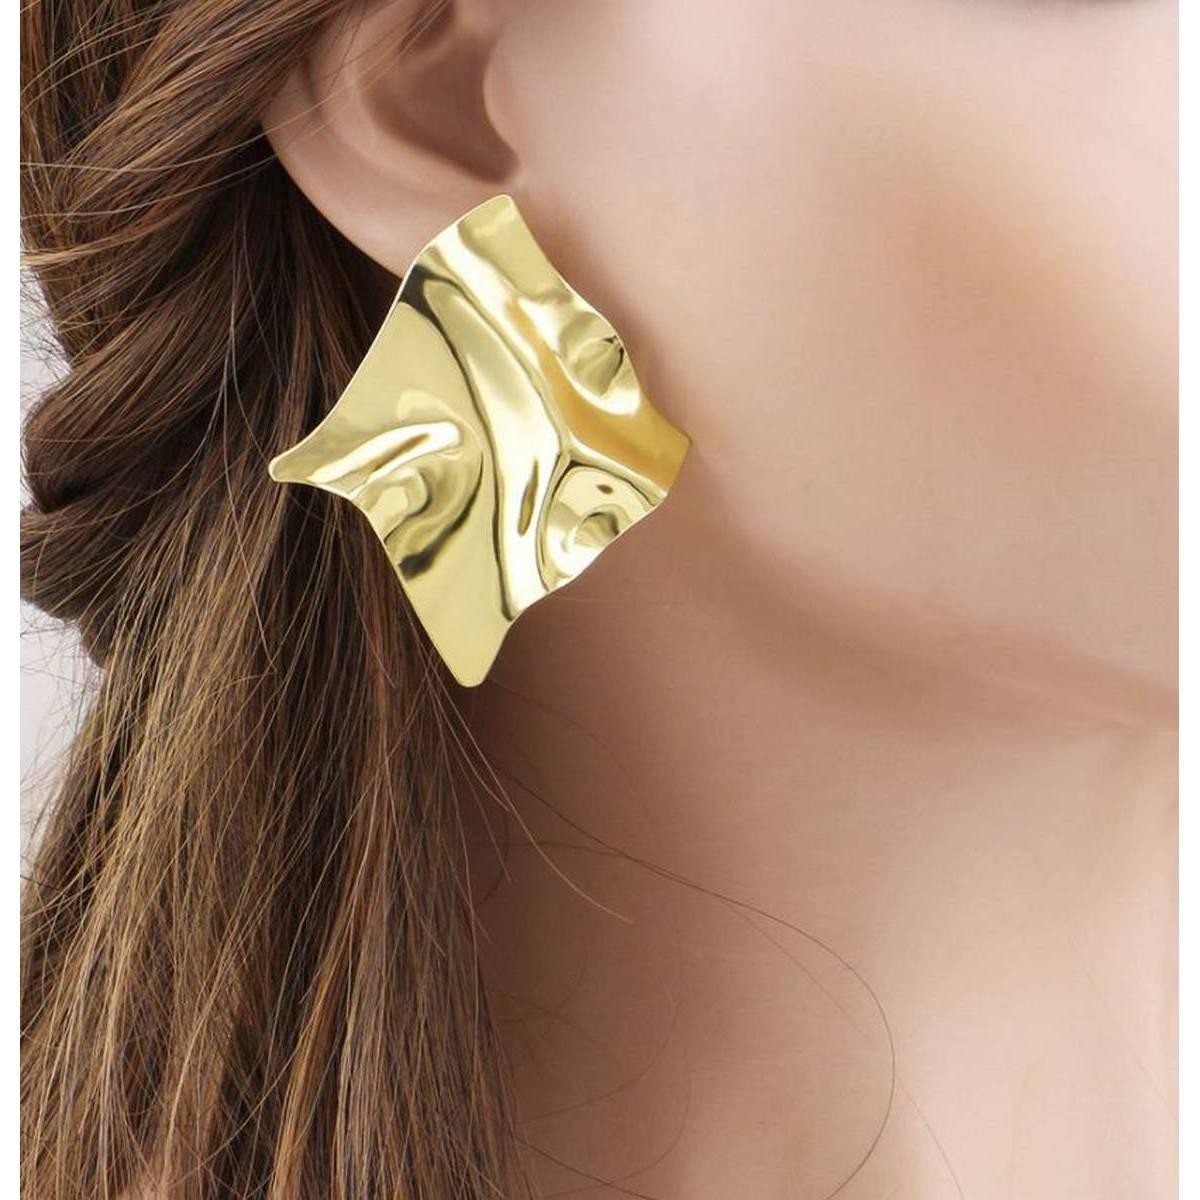 Classy Big Irregular Trendy Fashionable Earring